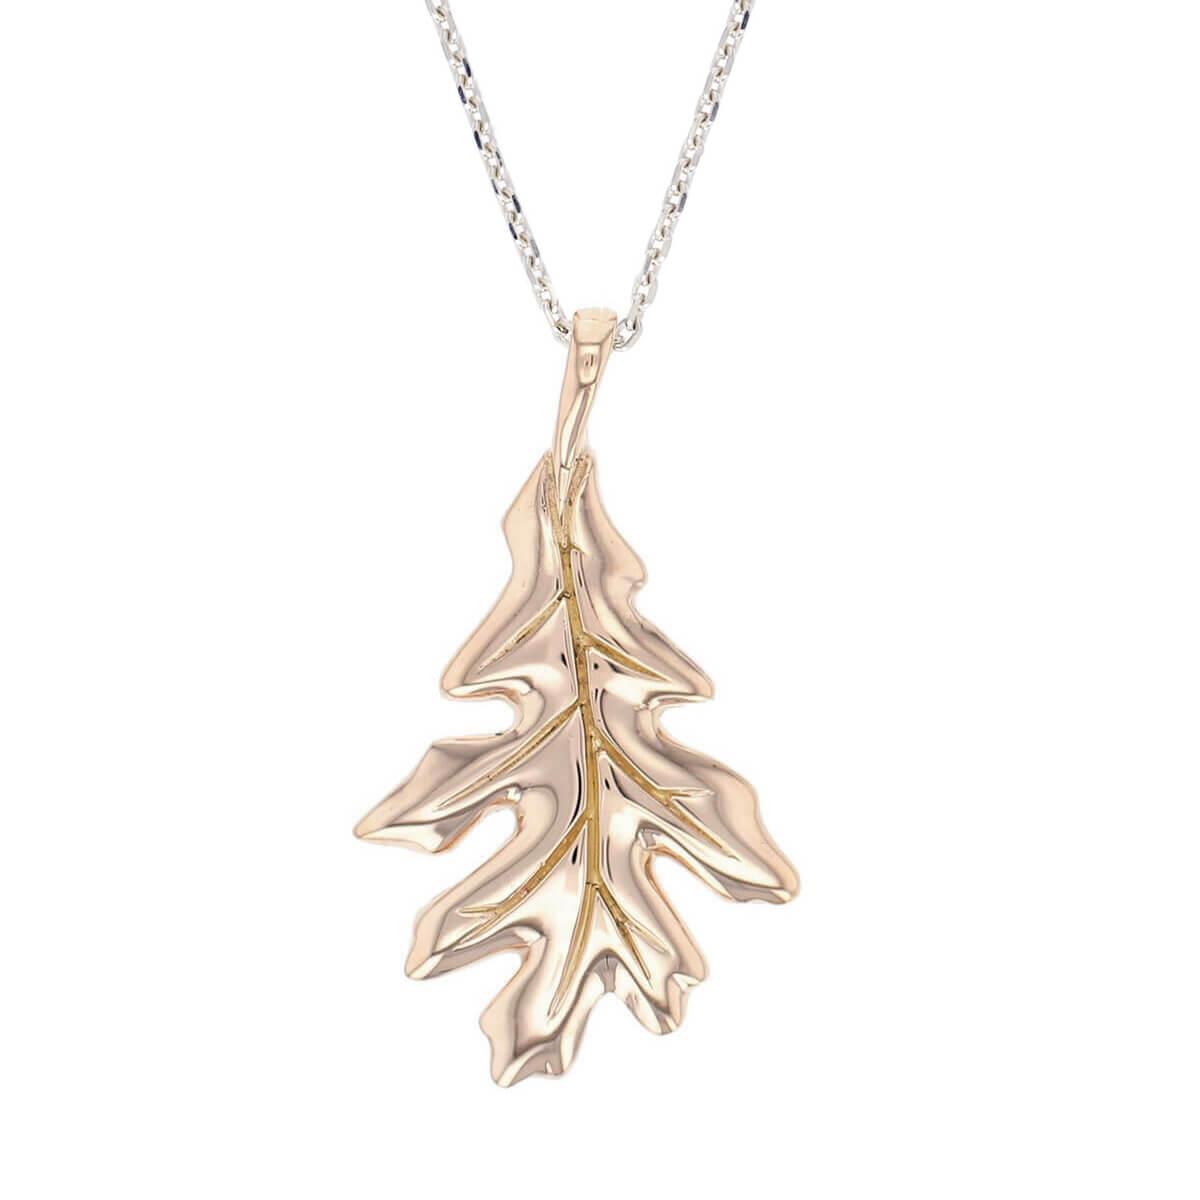 Faller Oakleaf, Derry, Londonderry, Northern Ireland, oak wood, acorn, angel, leaf, St Columba, St. Comcille, christian, heritage, historical, sterling silver & 18ct rose gold pendant